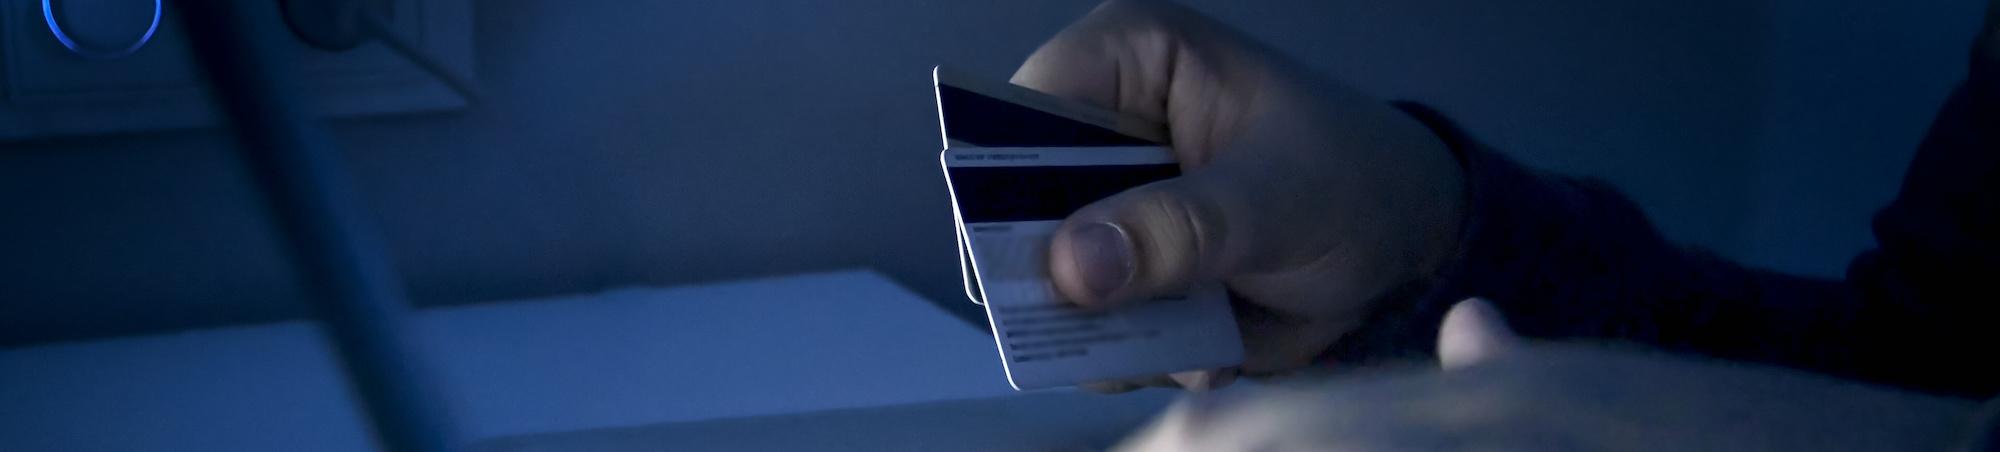 Stolen credit card information